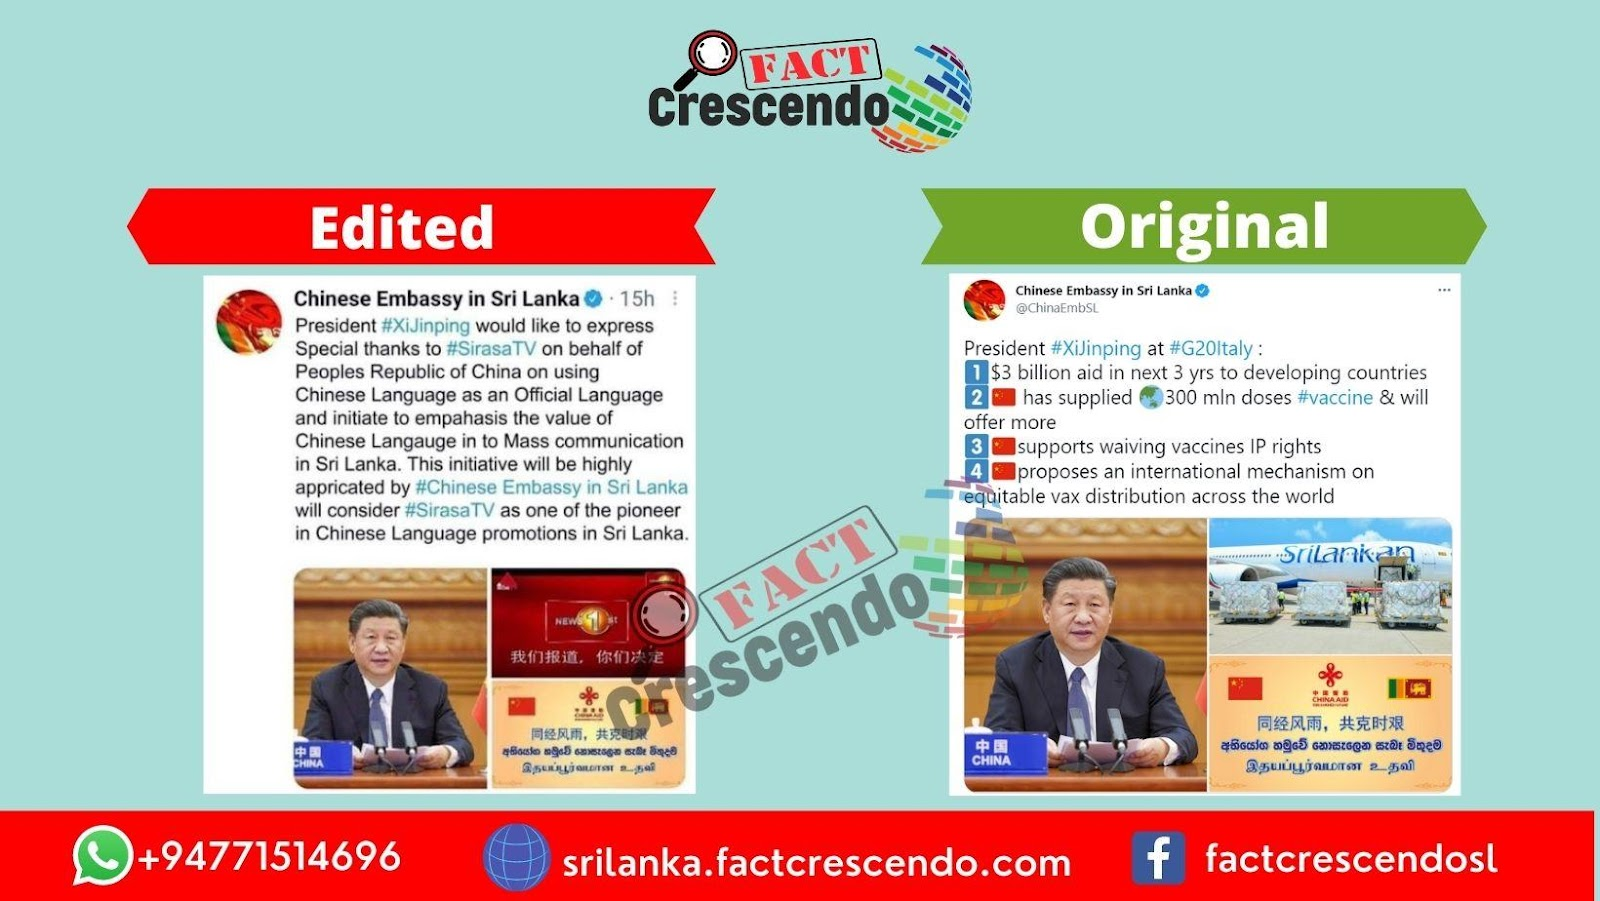 C:\Users\FCSL\Downloads\Horizontal Image Comparison.jpg